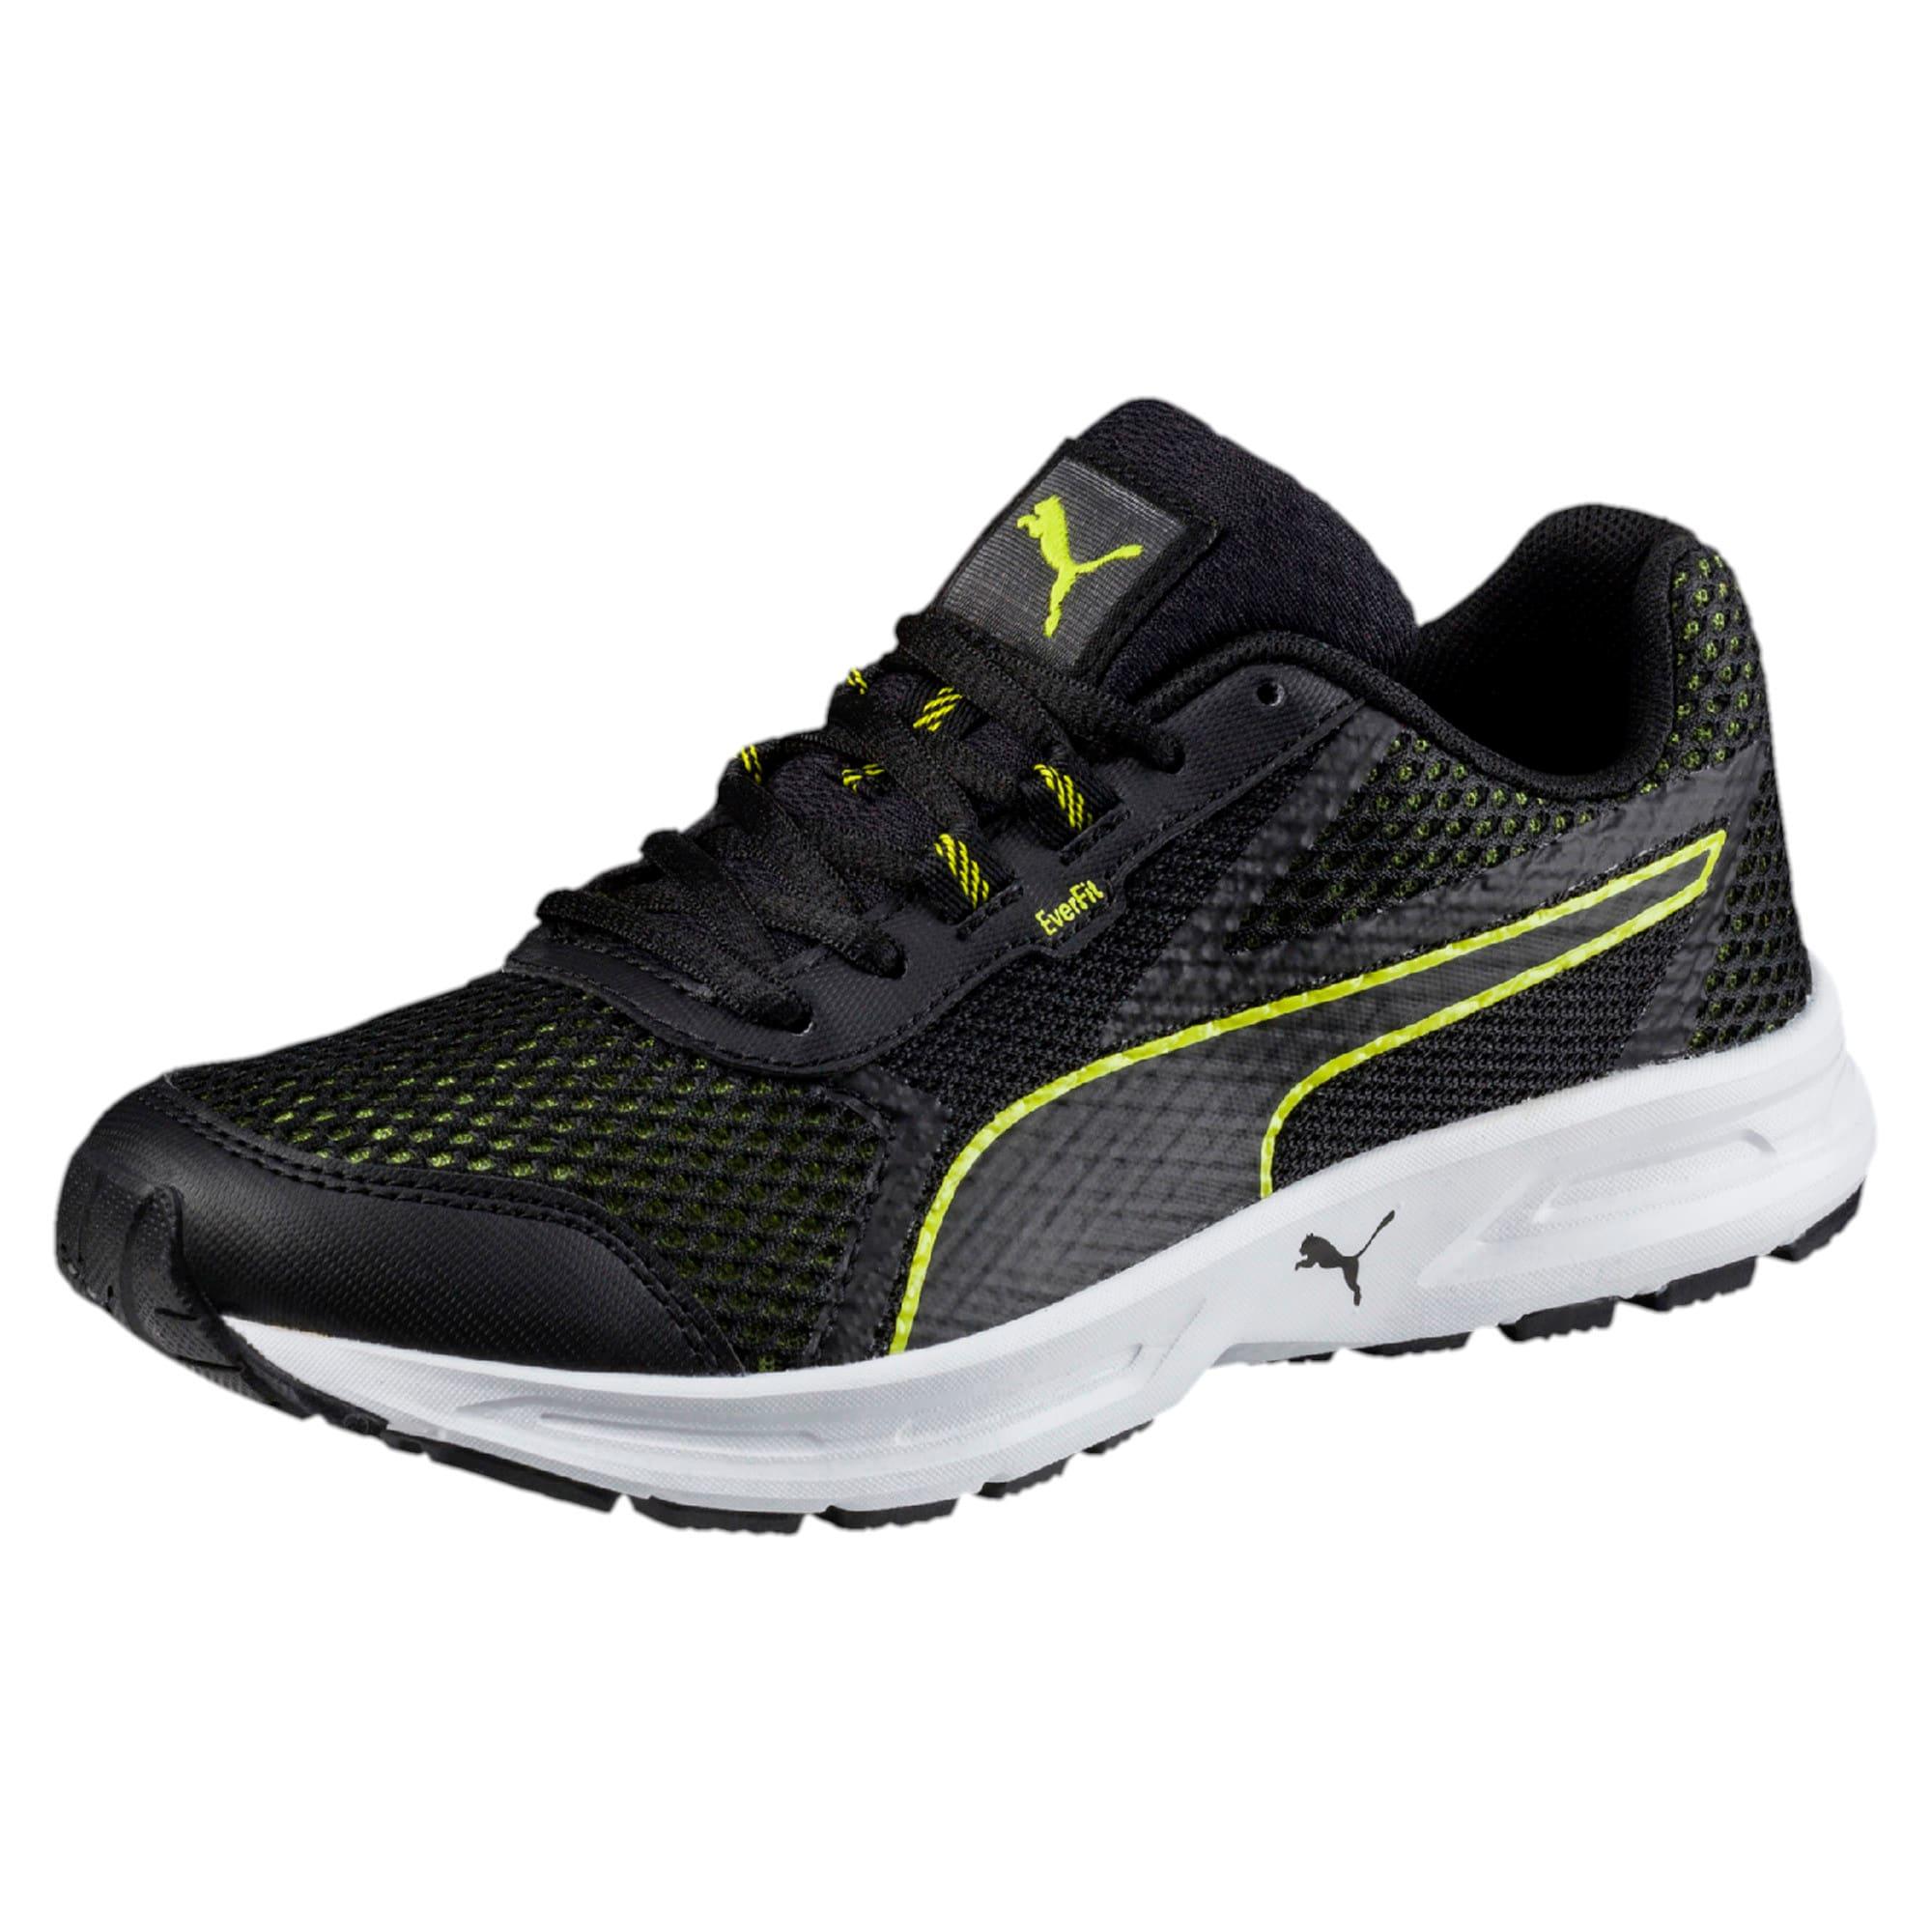 Thumbnail 1 of Essential Runner Kids' Running Shoes, Puma Black-Nrgy Yellow, medium-IND